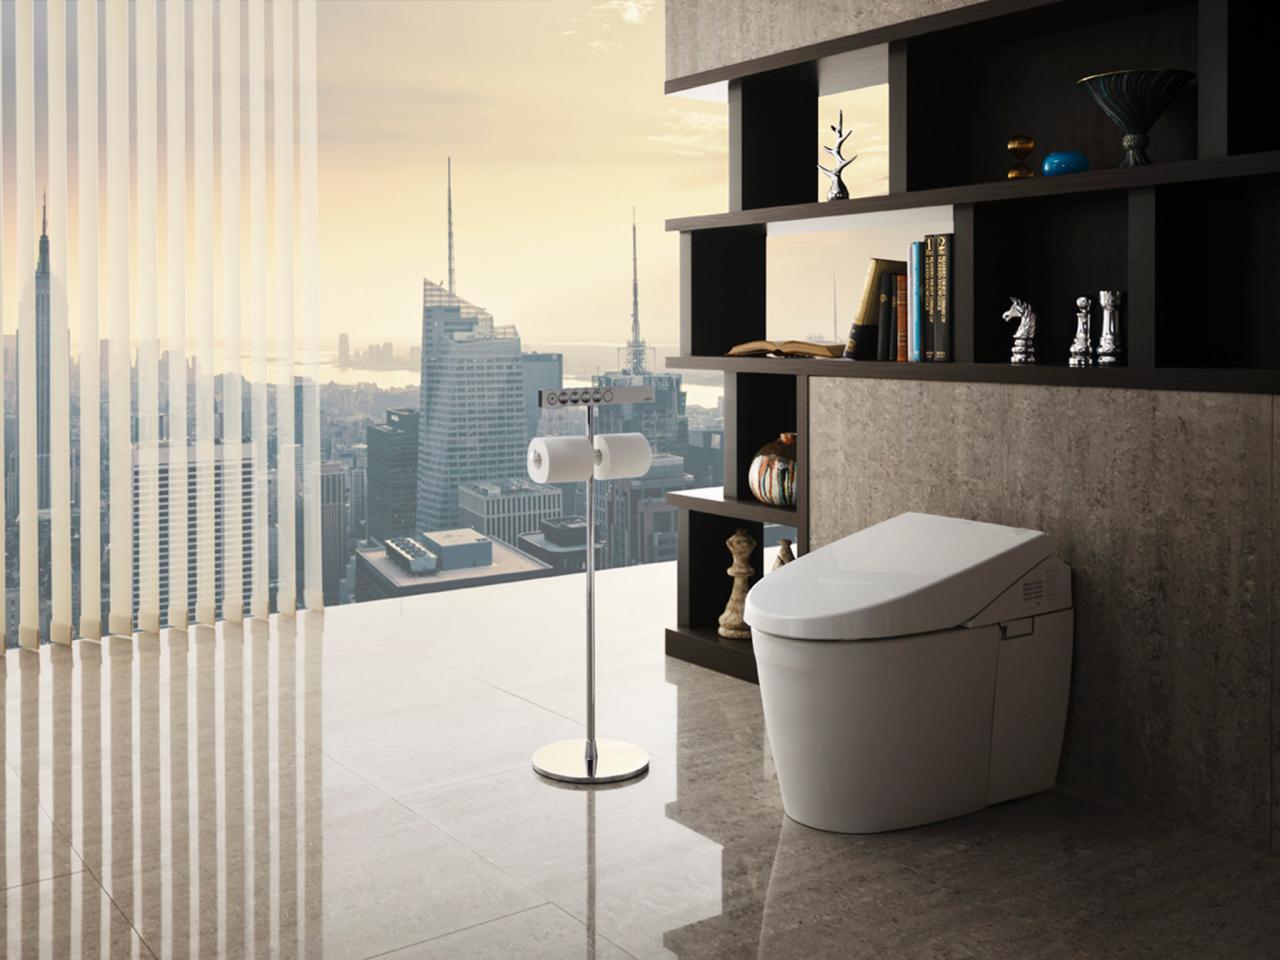 CI_Carley-Knobloch-SSS-toto-toilet.jpg.rend.hgtvcom.1280.960.jpeg